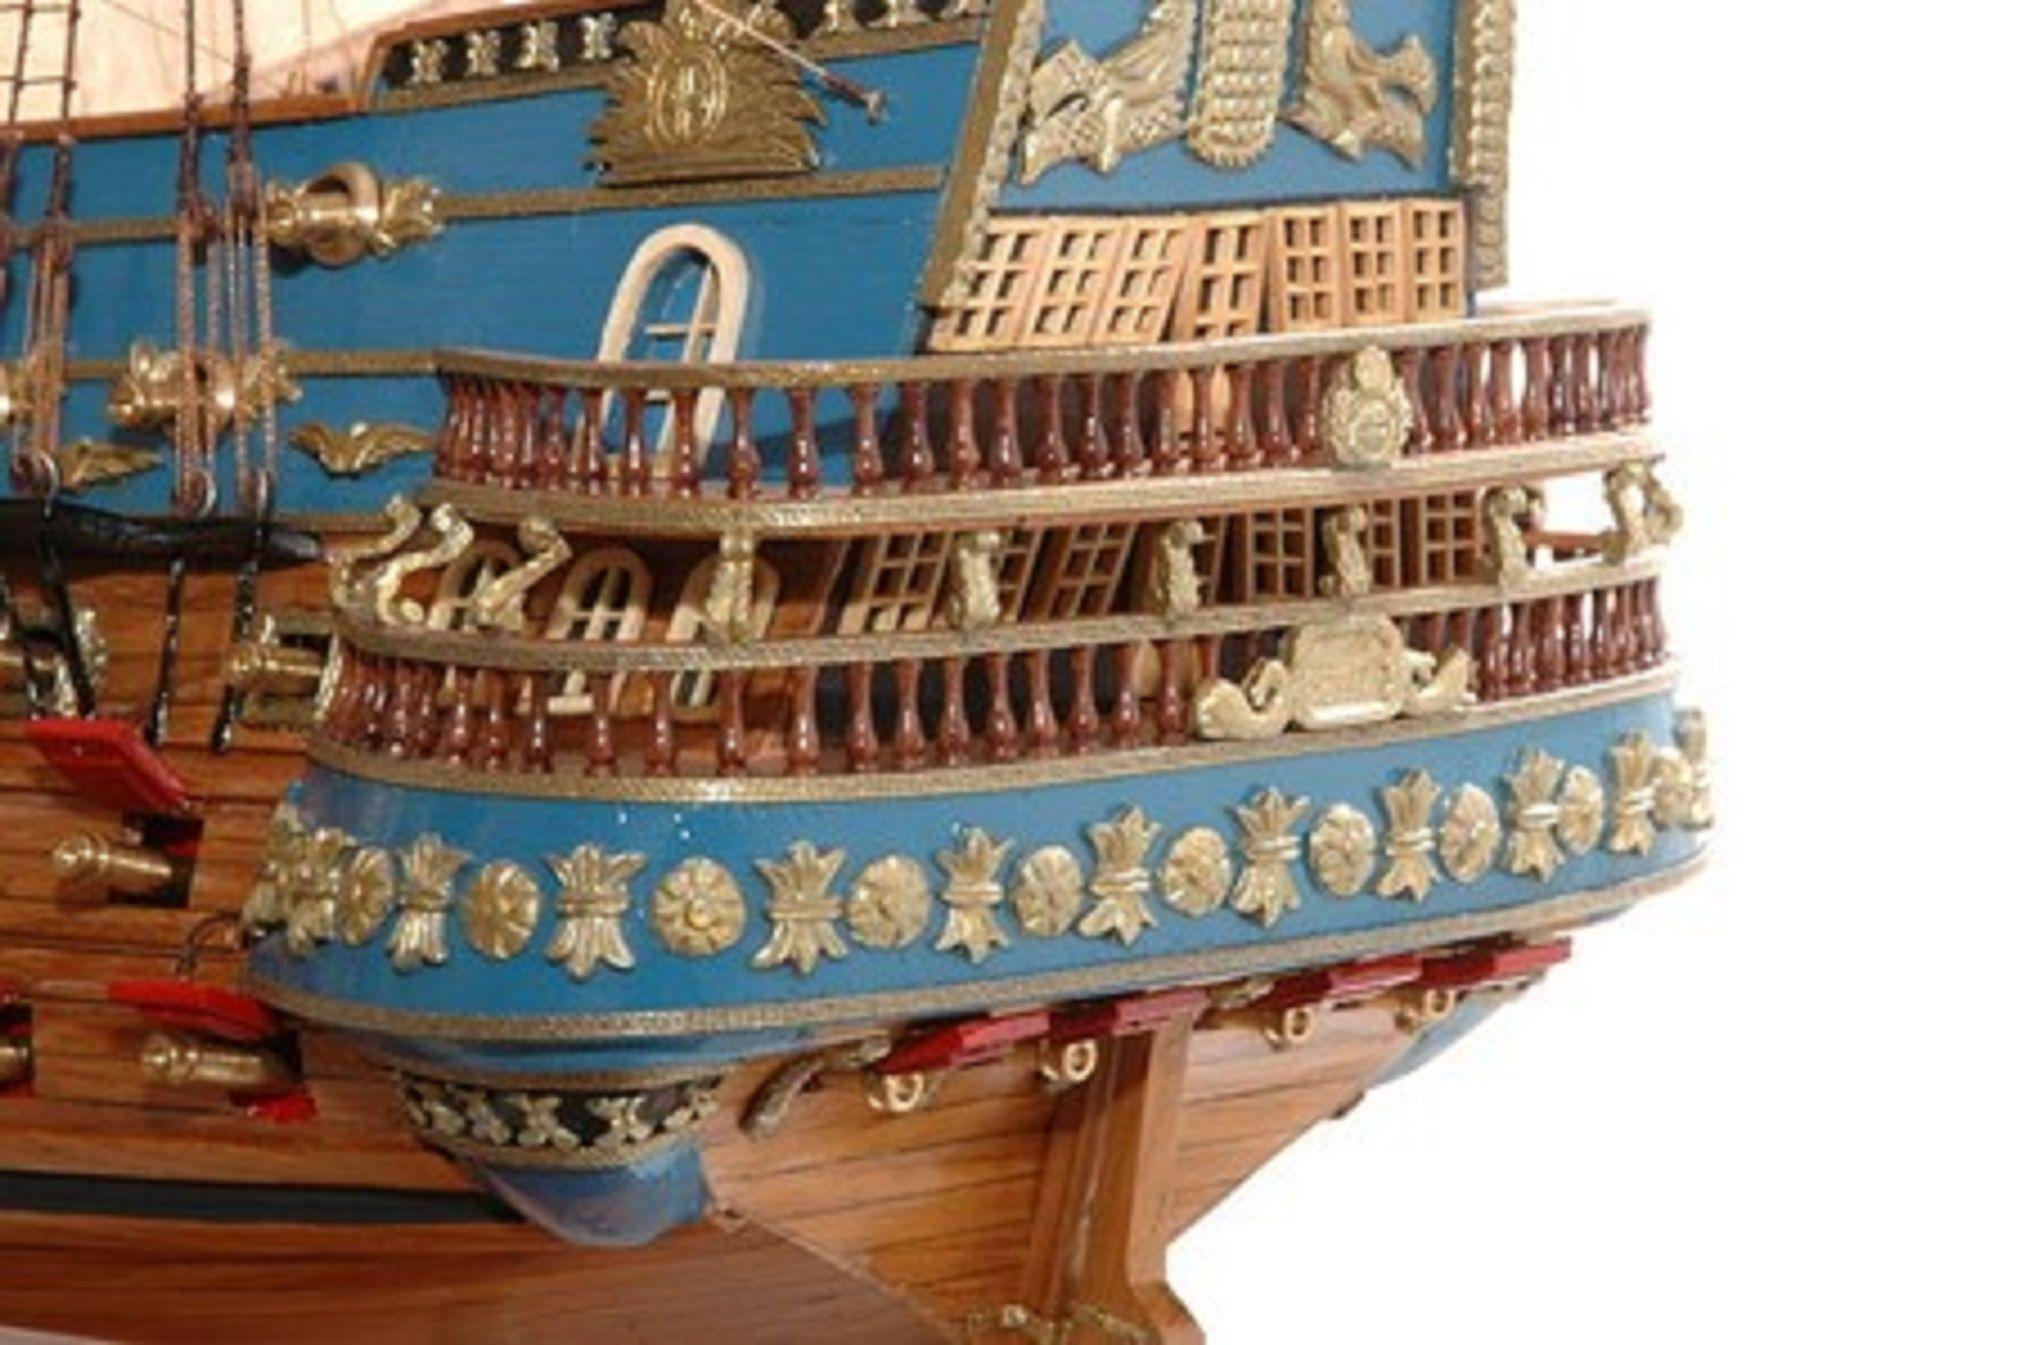 1418-7605-San-Felipe-model-ship-Extra-Large-Premier-Range